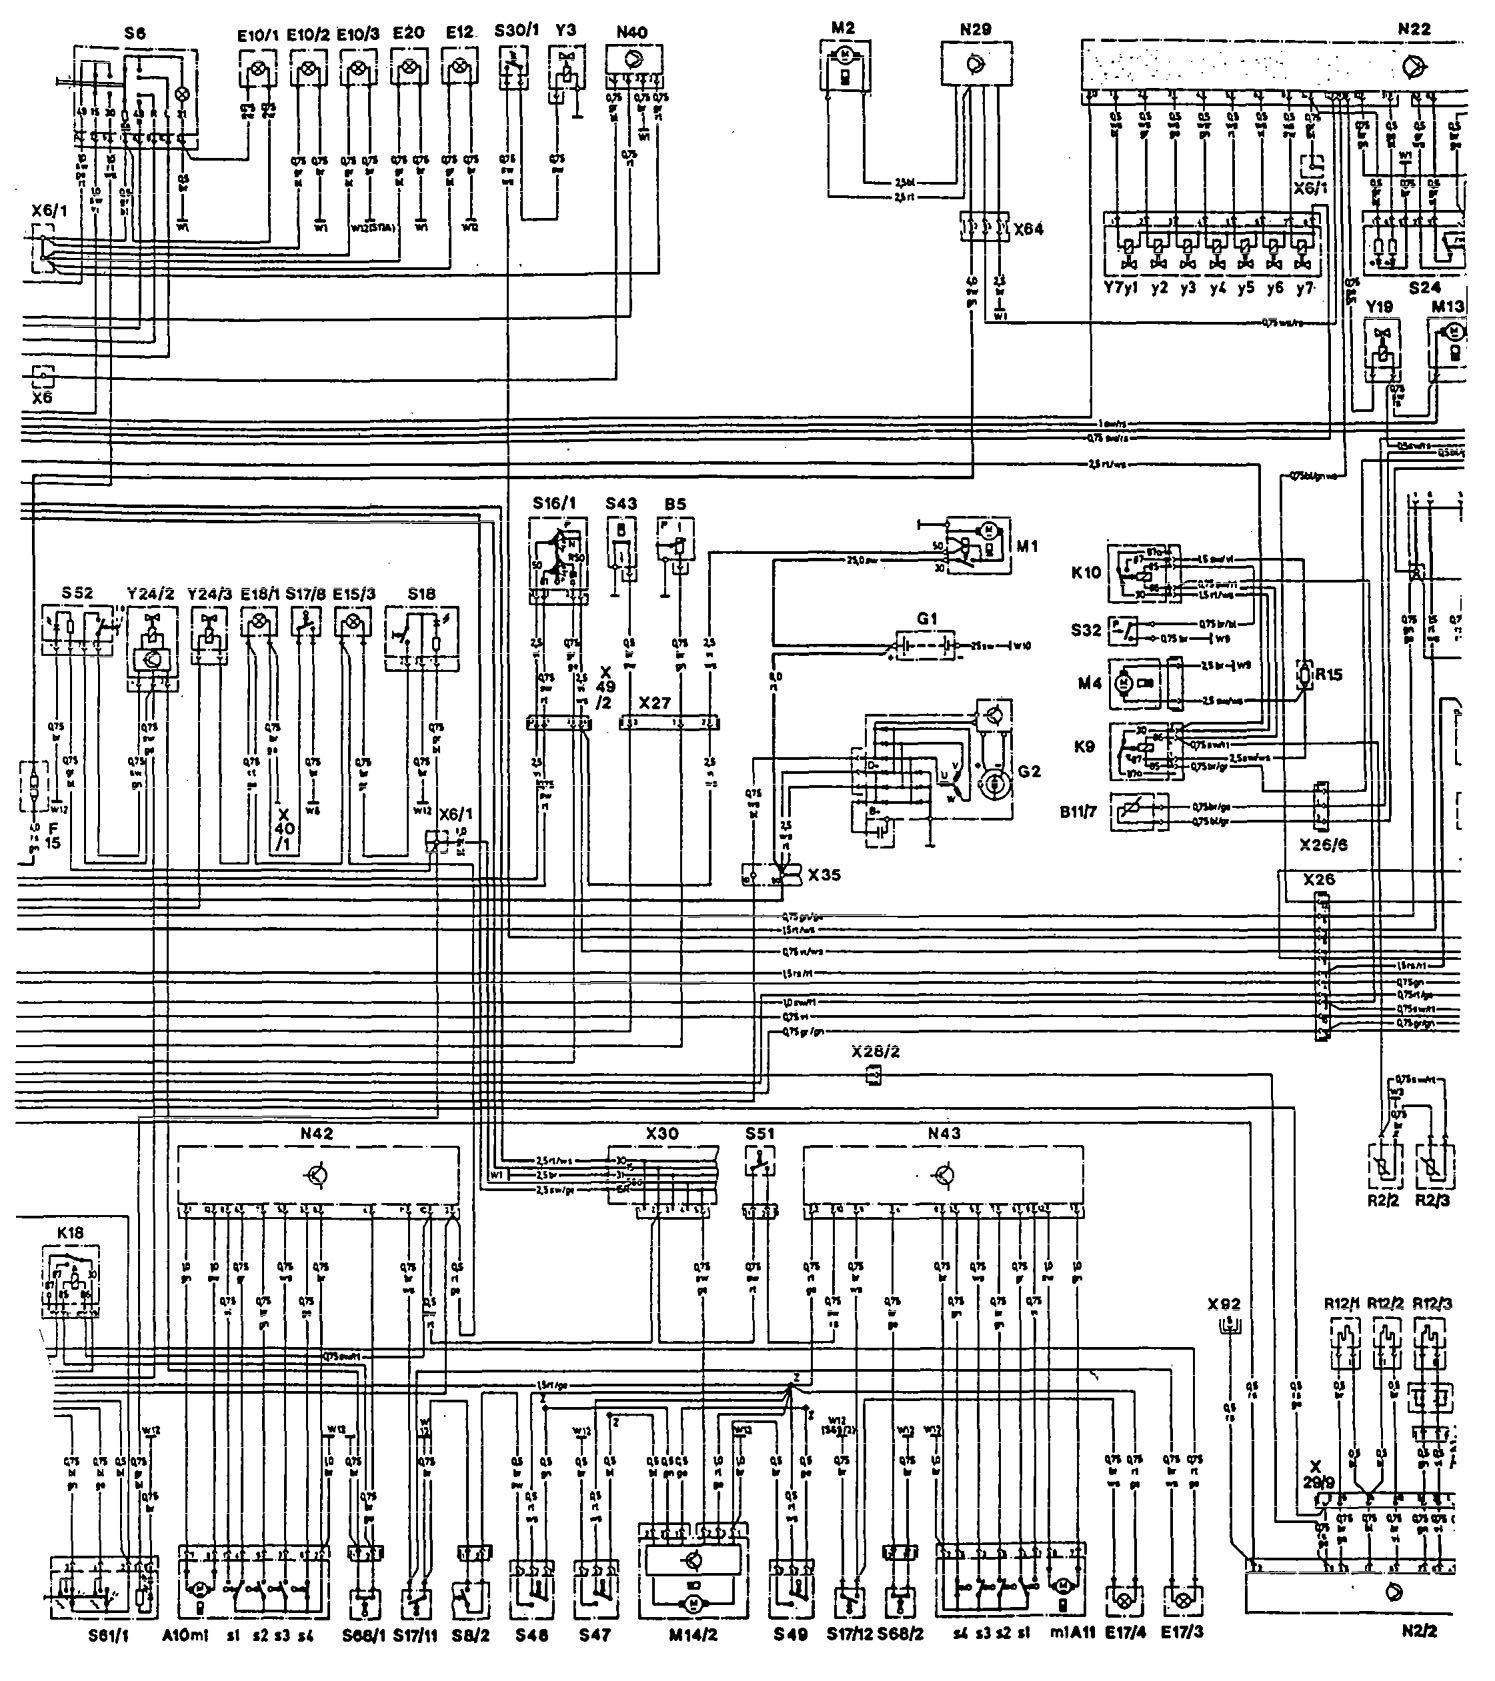 mercedes benz w124 wiring diagram alternator 560c nema 14